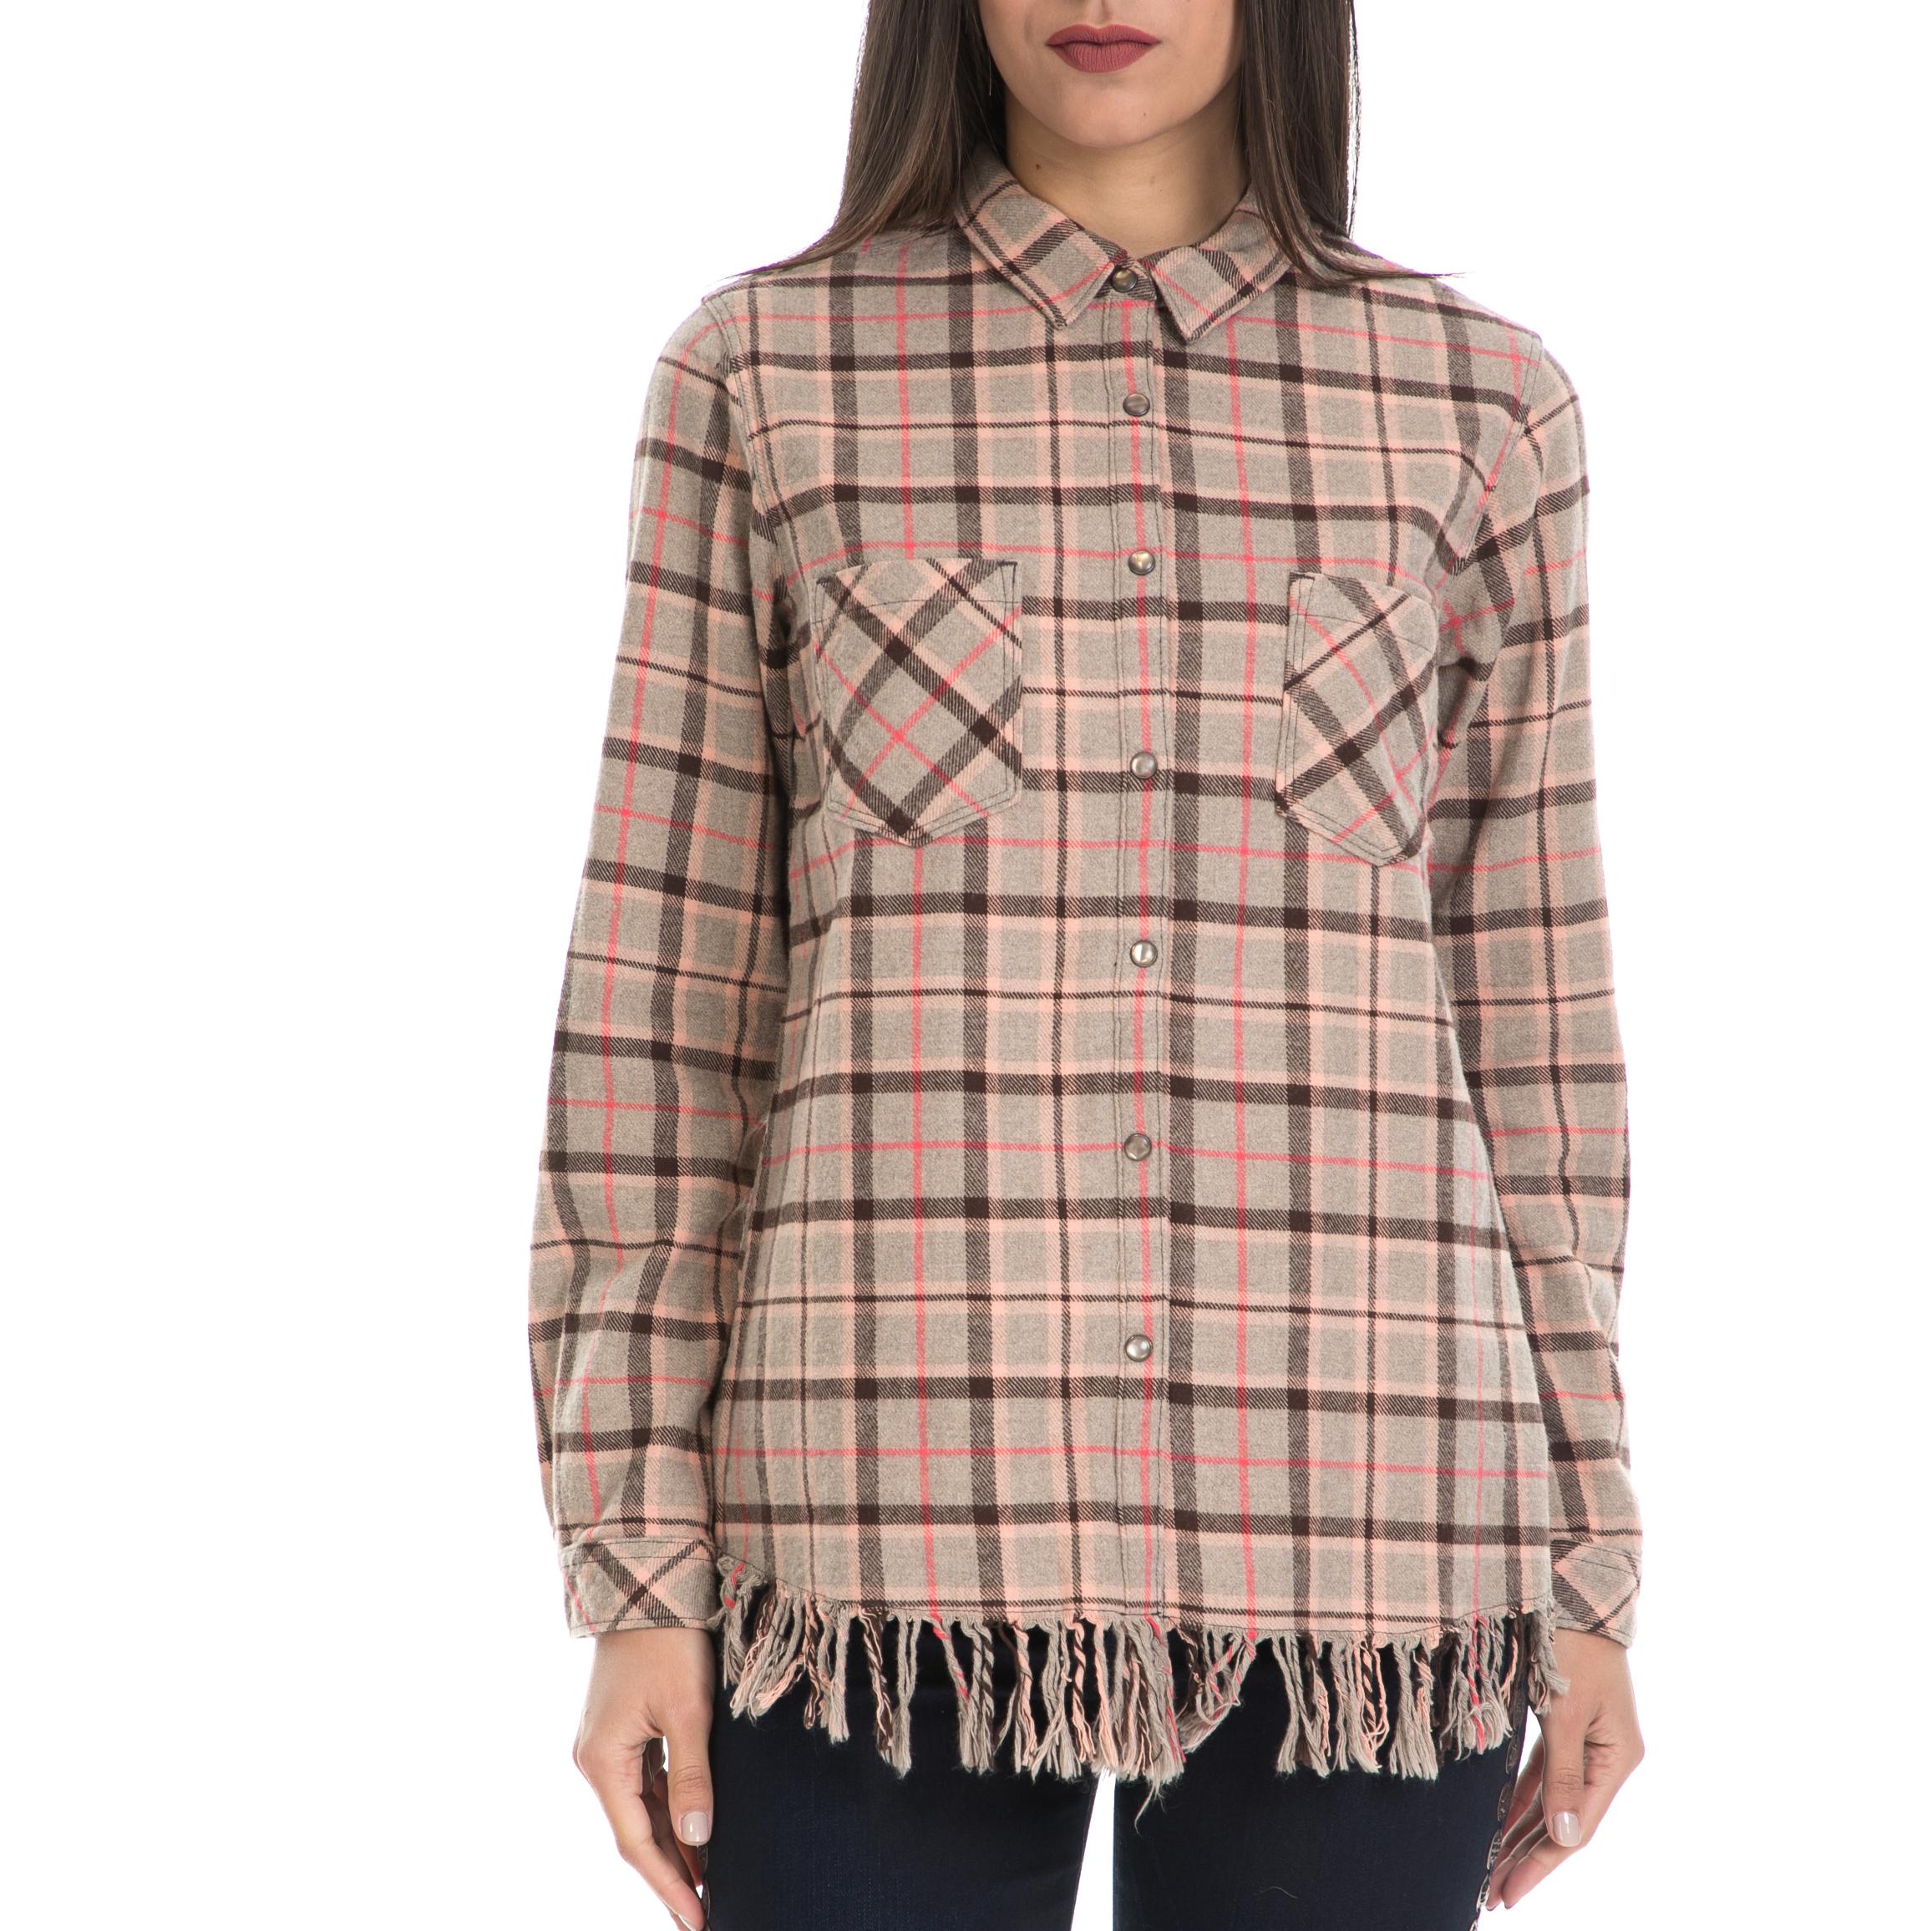 MAISON SCOTCH – Γυναικείο πουκάμισο MAISON SCOTCH μπεζ-καφέ